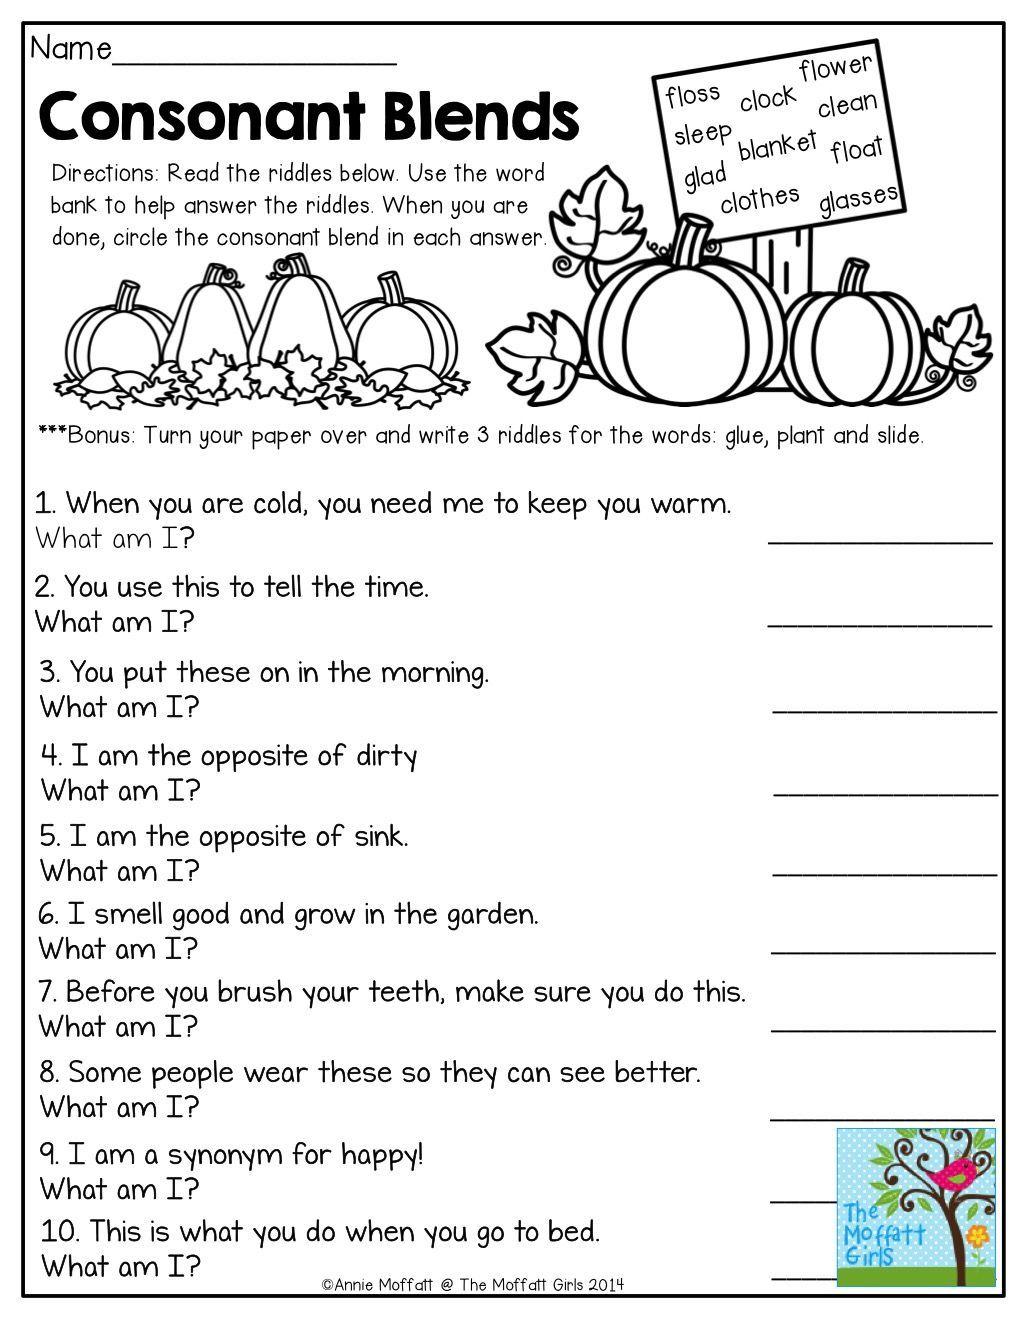 Consonant Blends Worksheets For Grade 3 Consonant Blends Worksheets Blends Worksheets Phonics Worksheets